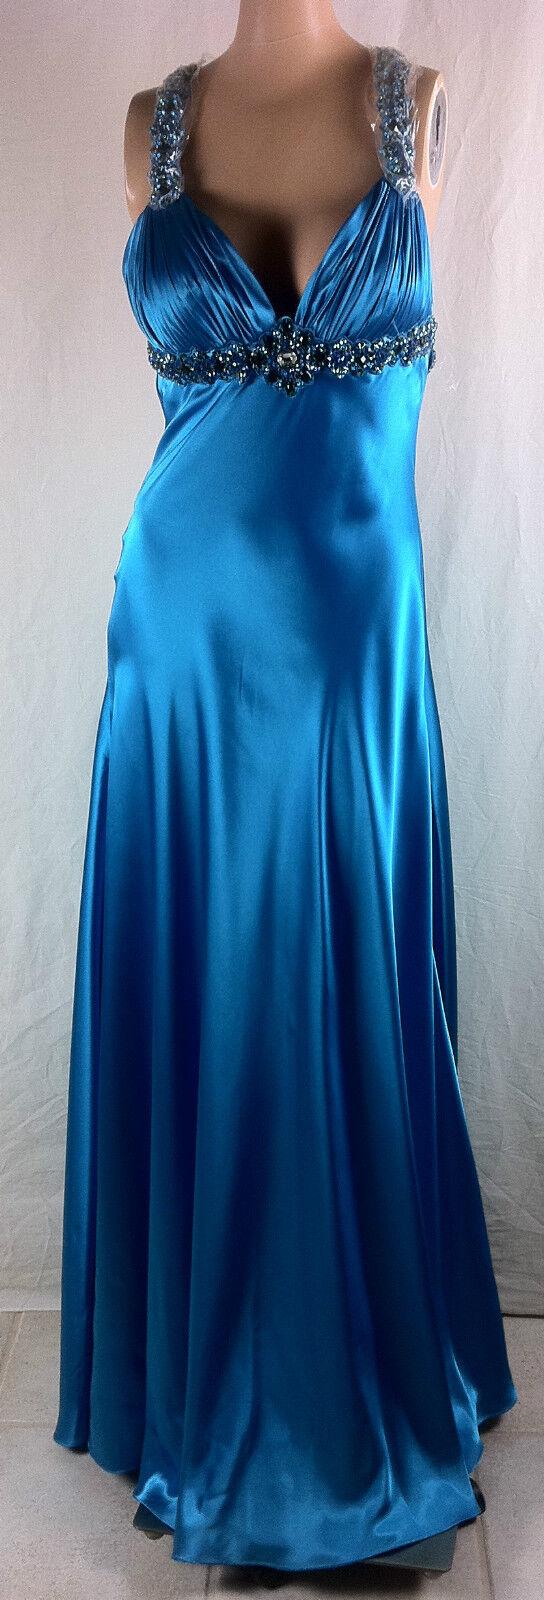 New Womens Shimmer by Bari Jay Gem Stones Straps Empire Waist Gown Dress SZ 6